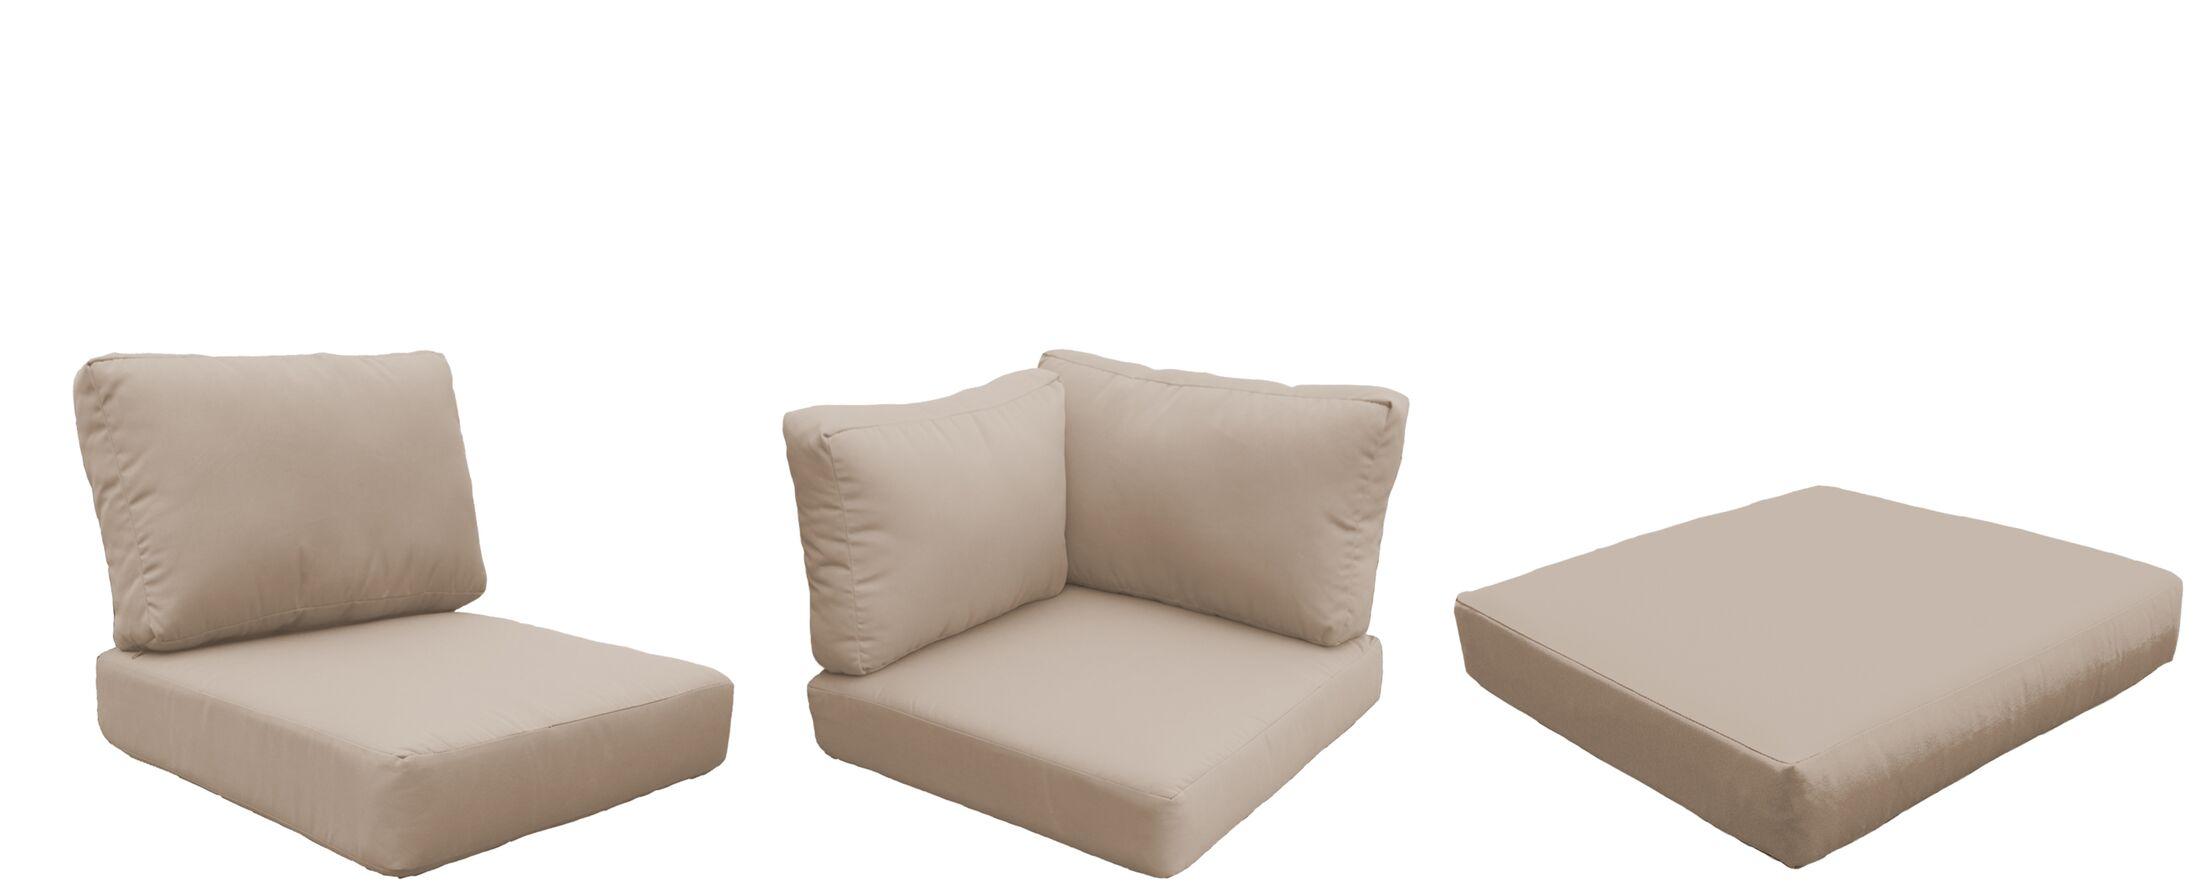 Barbados 22 Piece Outdoor Cushion Set Fabric: Wheat